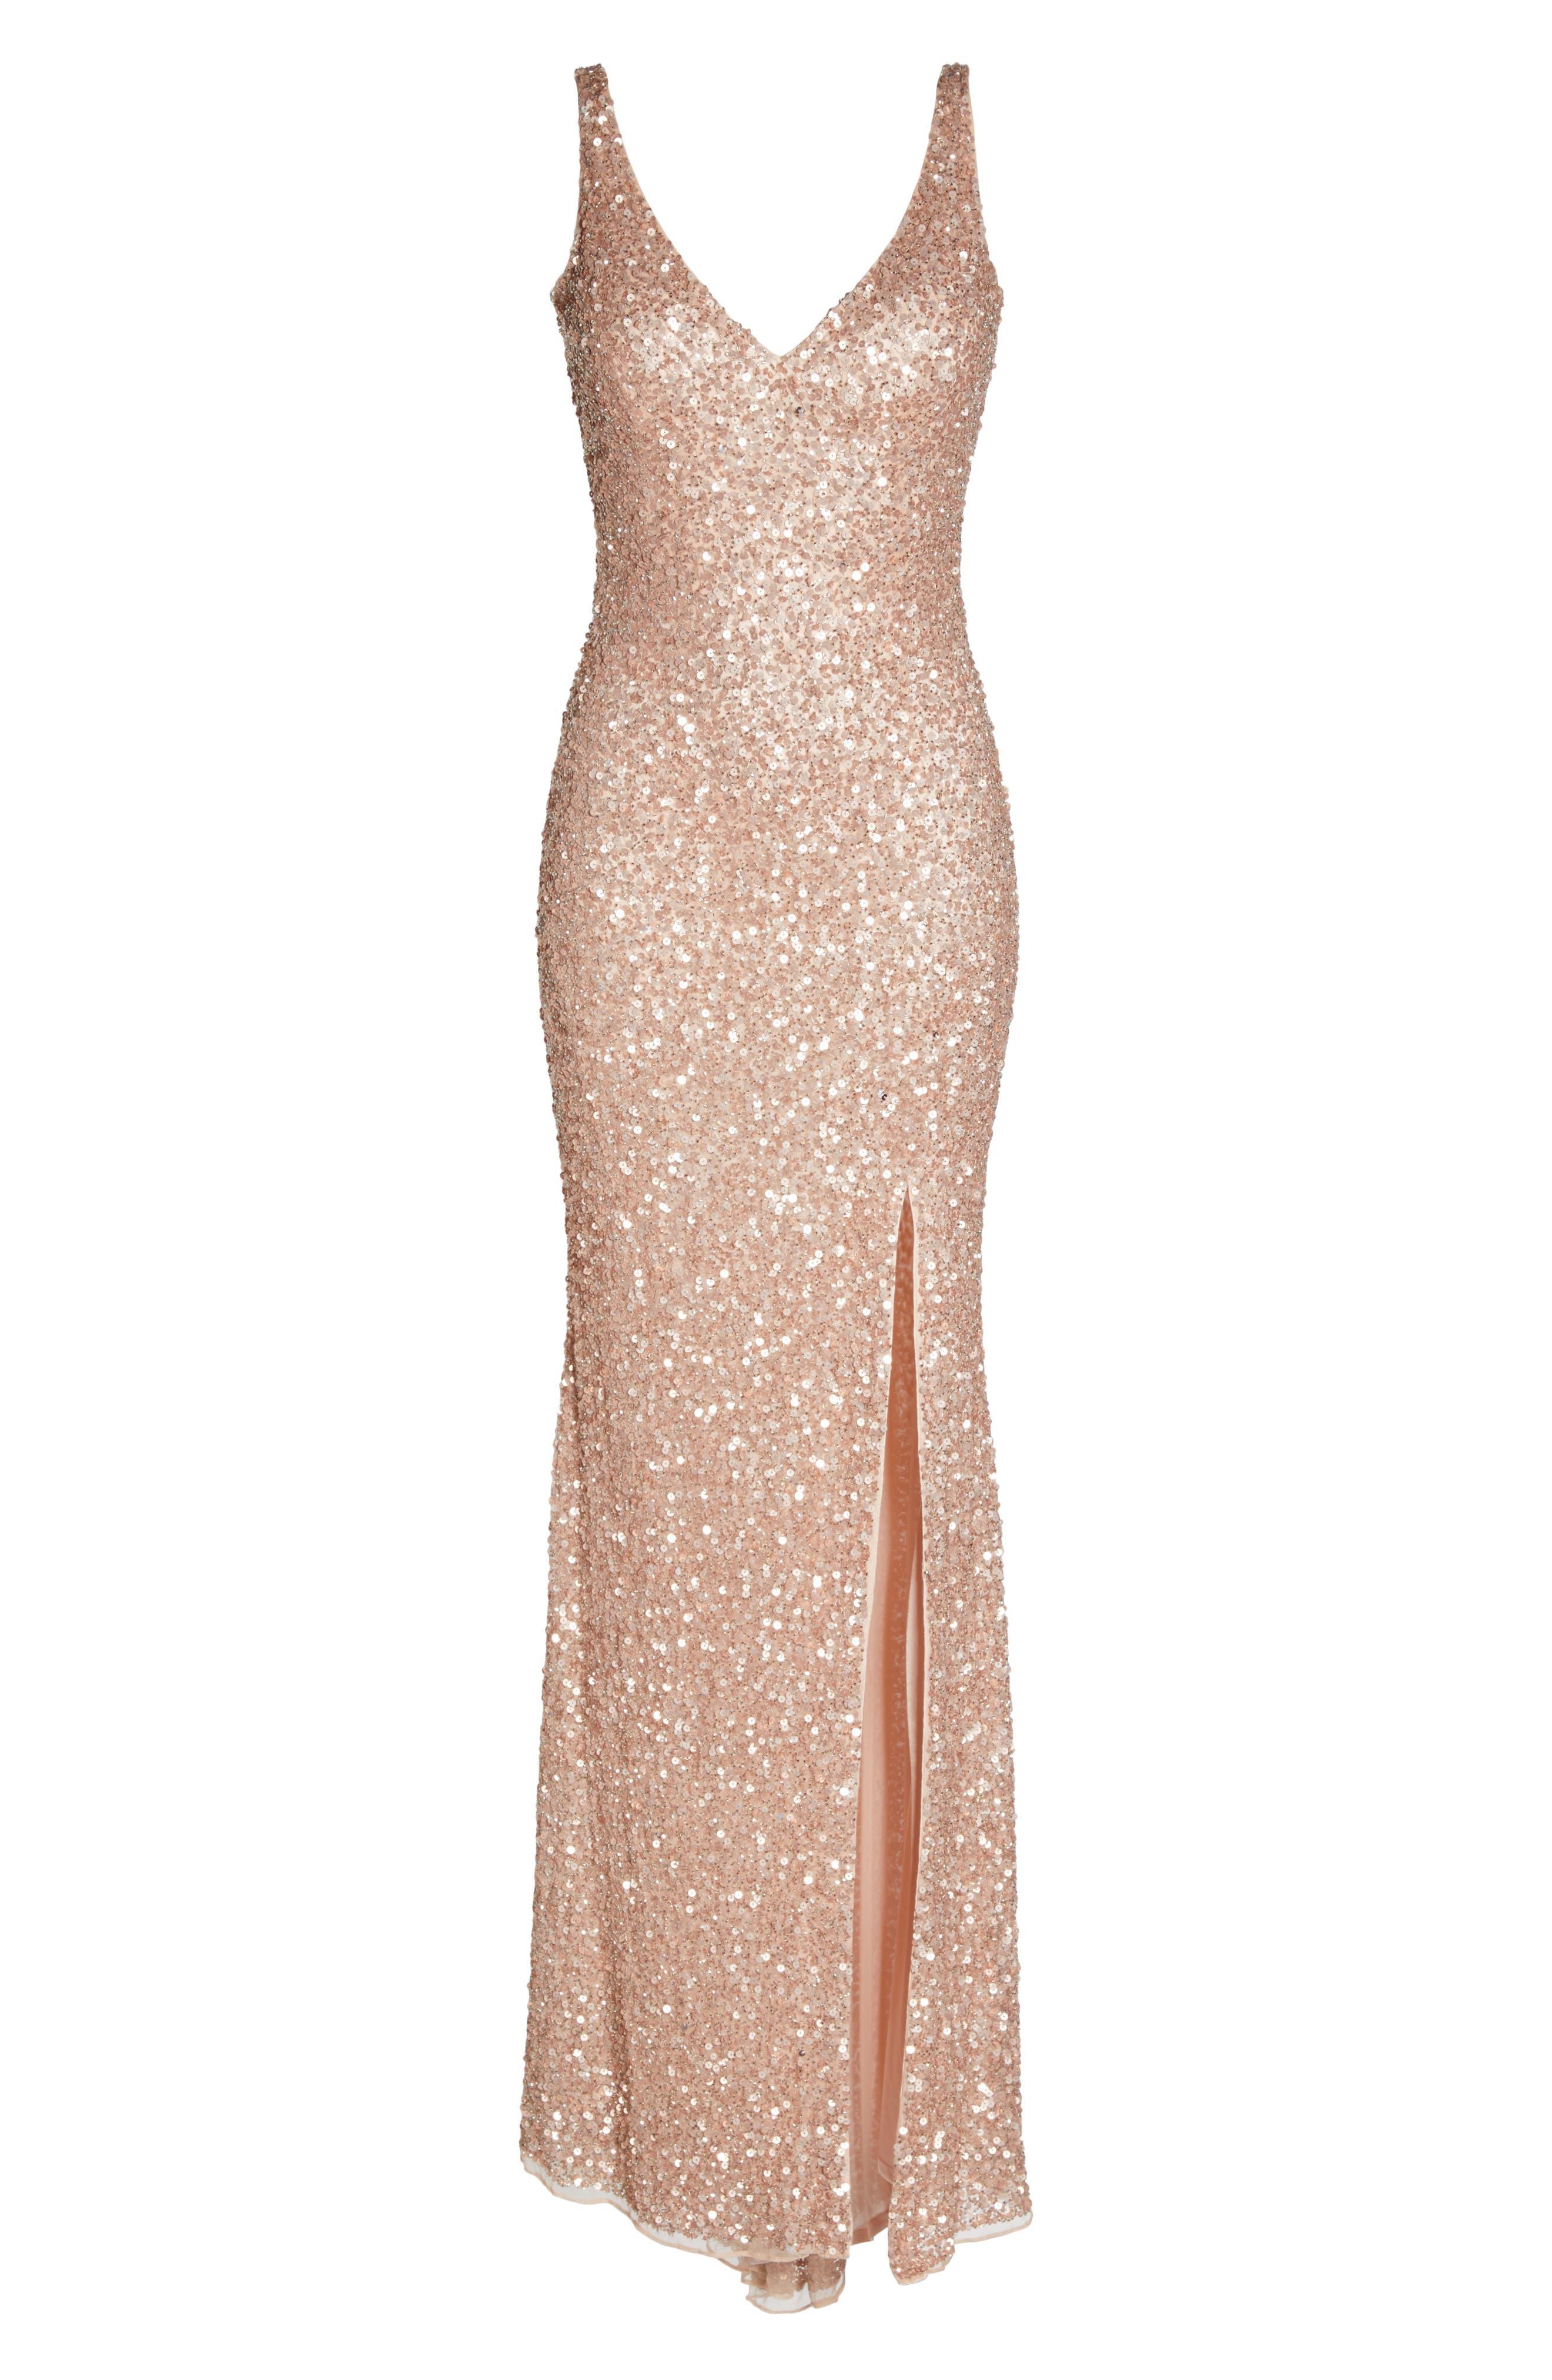 MAC DUGGAL, Sequin Slit Gown, Alternate thumbnail 6, color, ROSE GOLD